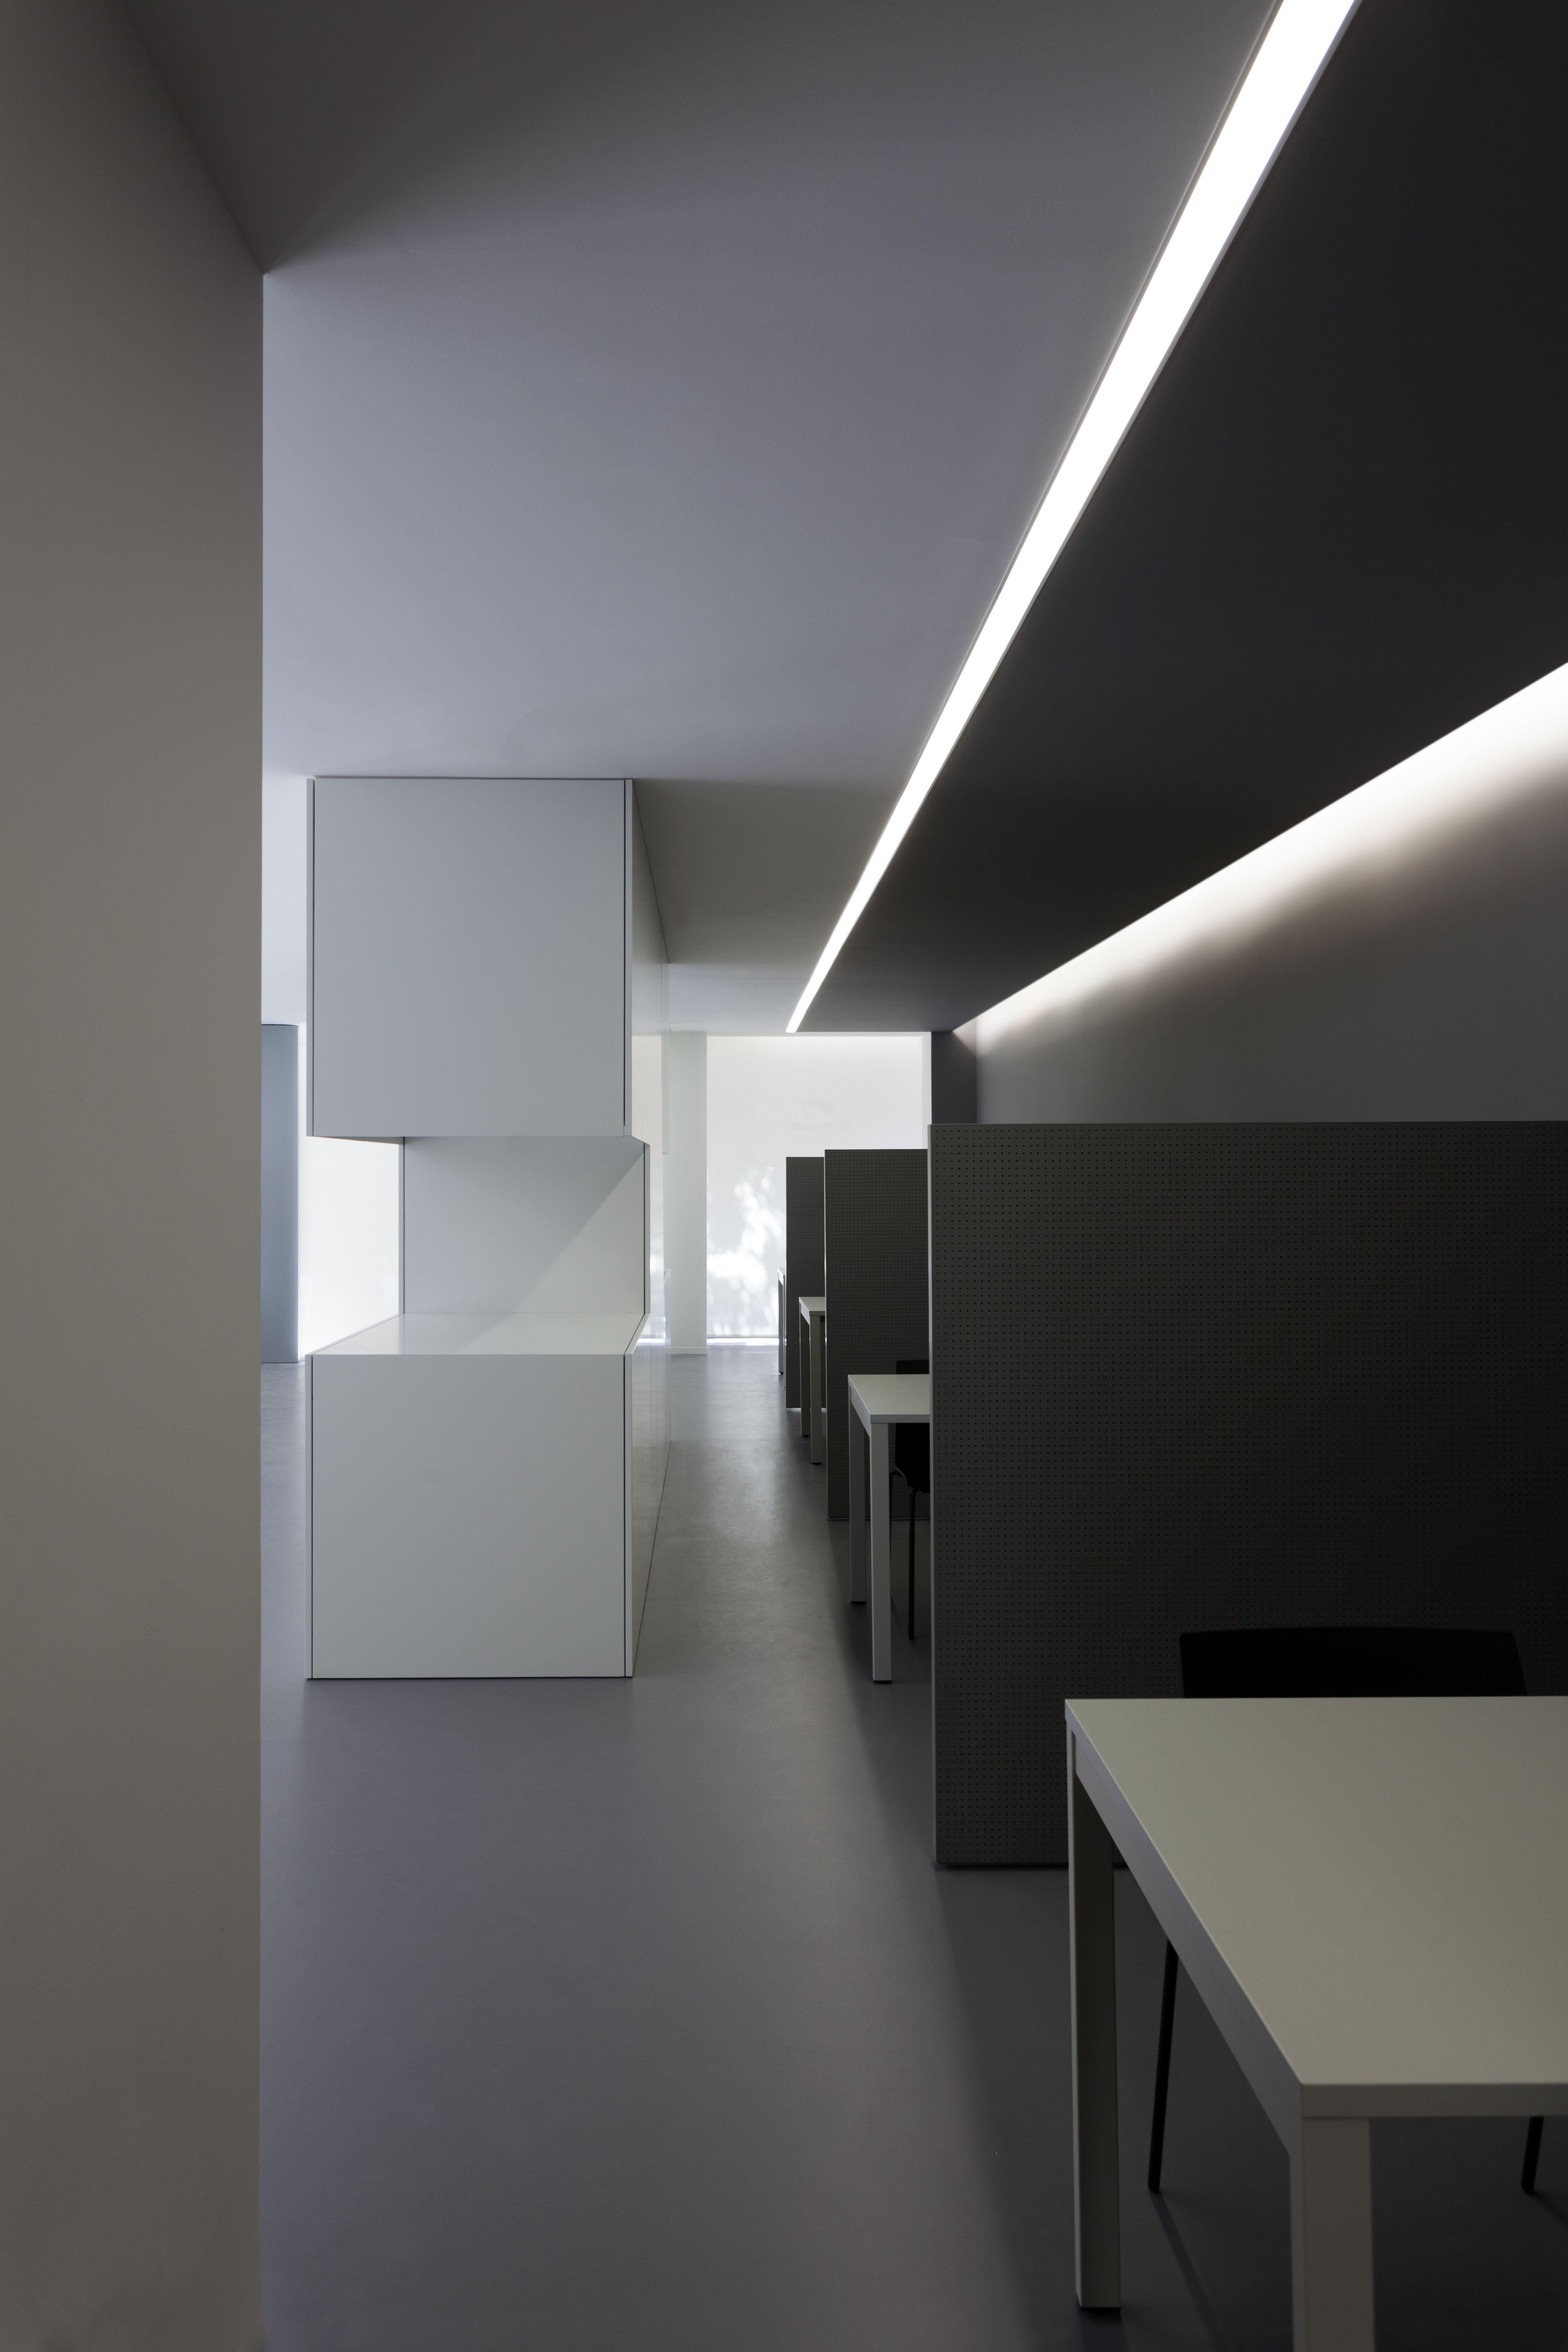 minimal office. #fransilvestrearquitectos #alfarohofmann #architecture #arquitectura # Minimal #office #space #lineallight #workspace #oficina #luz #white #interiordesign Office N